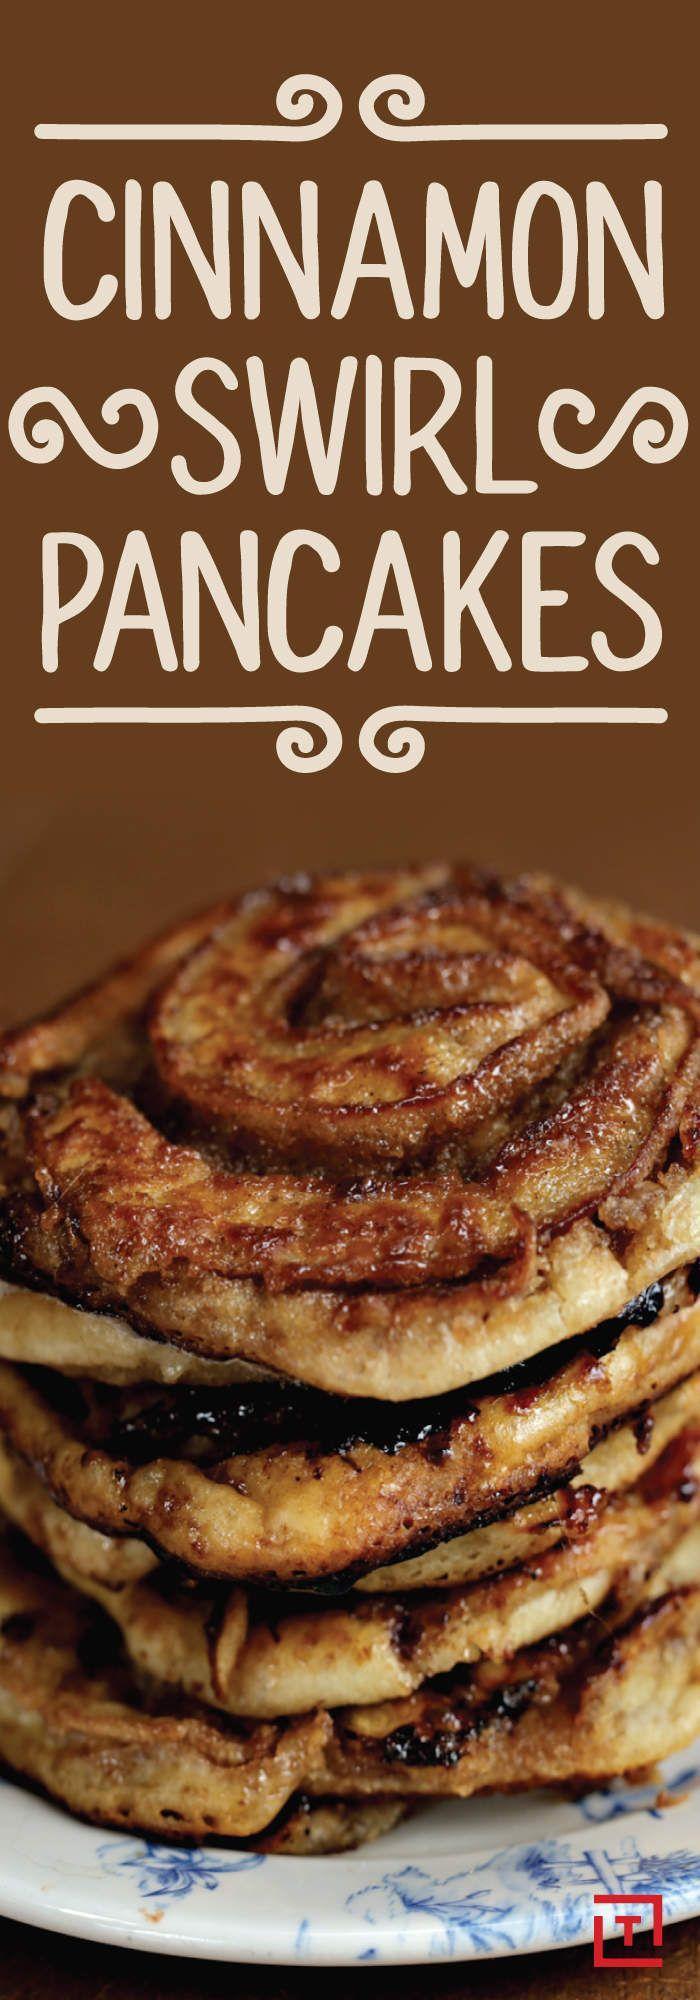 Cinnamon swirl pancakes...enough said